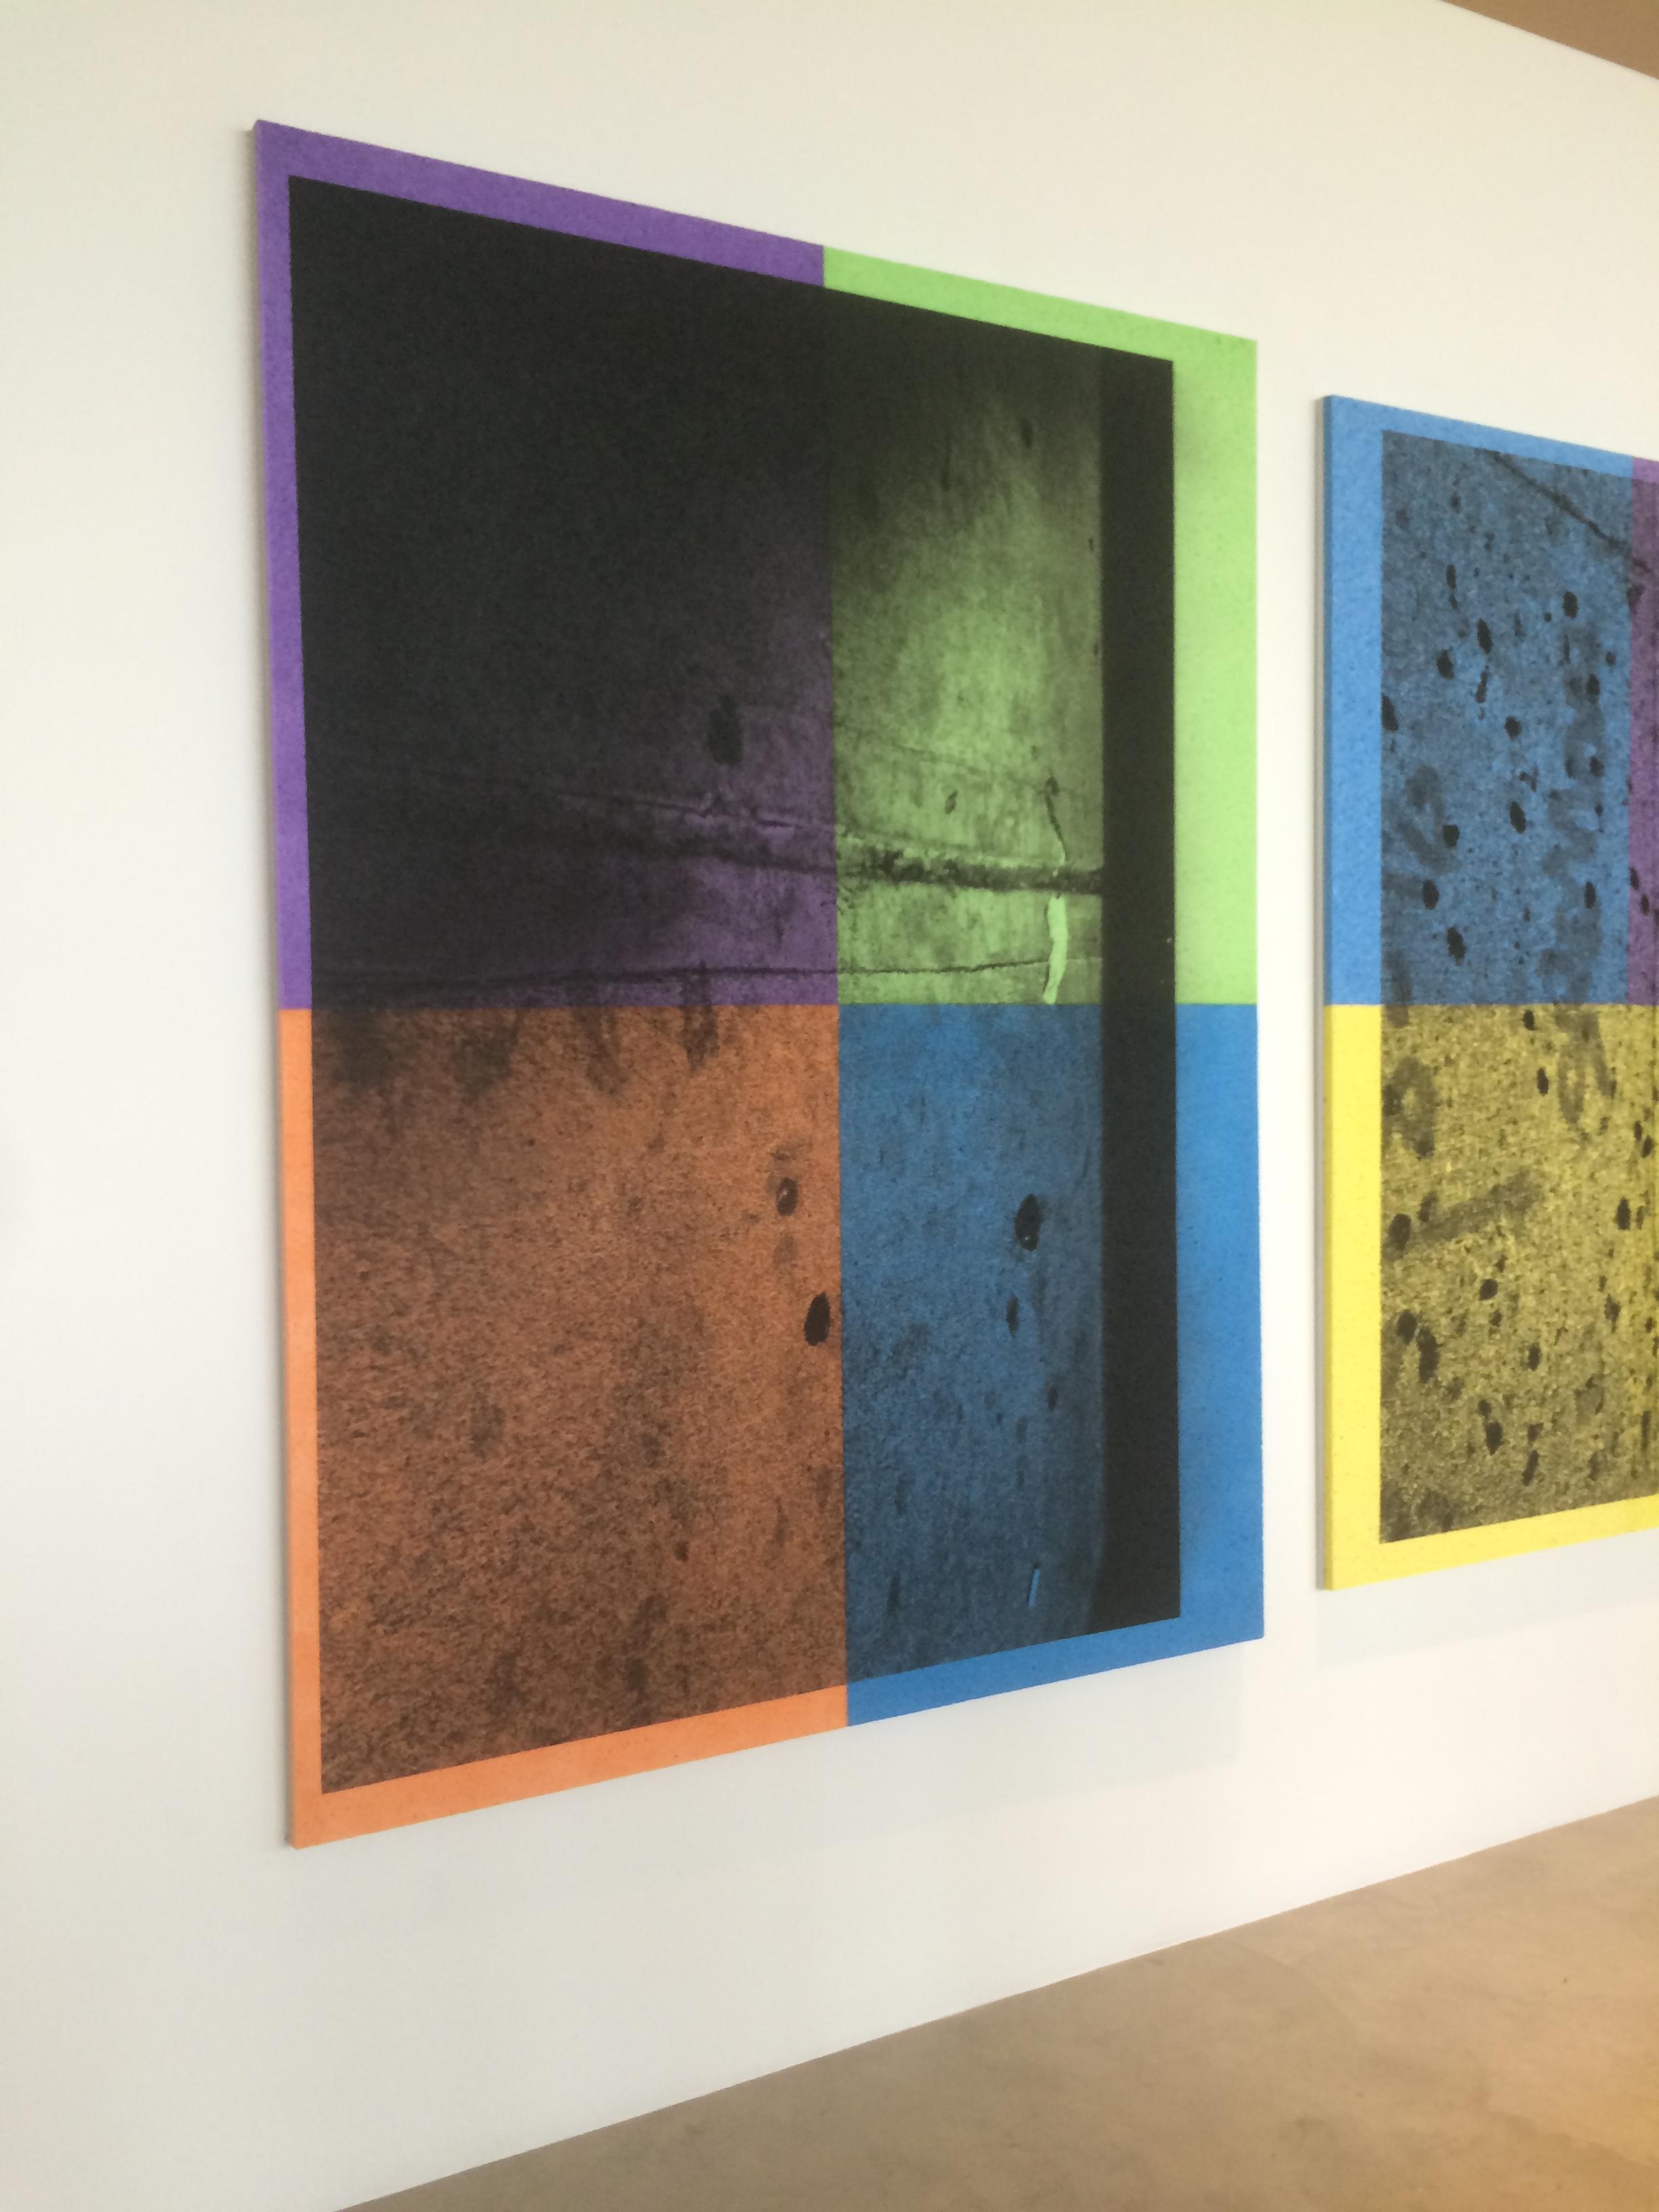 Ethan Mc at De La Cruz Collection.